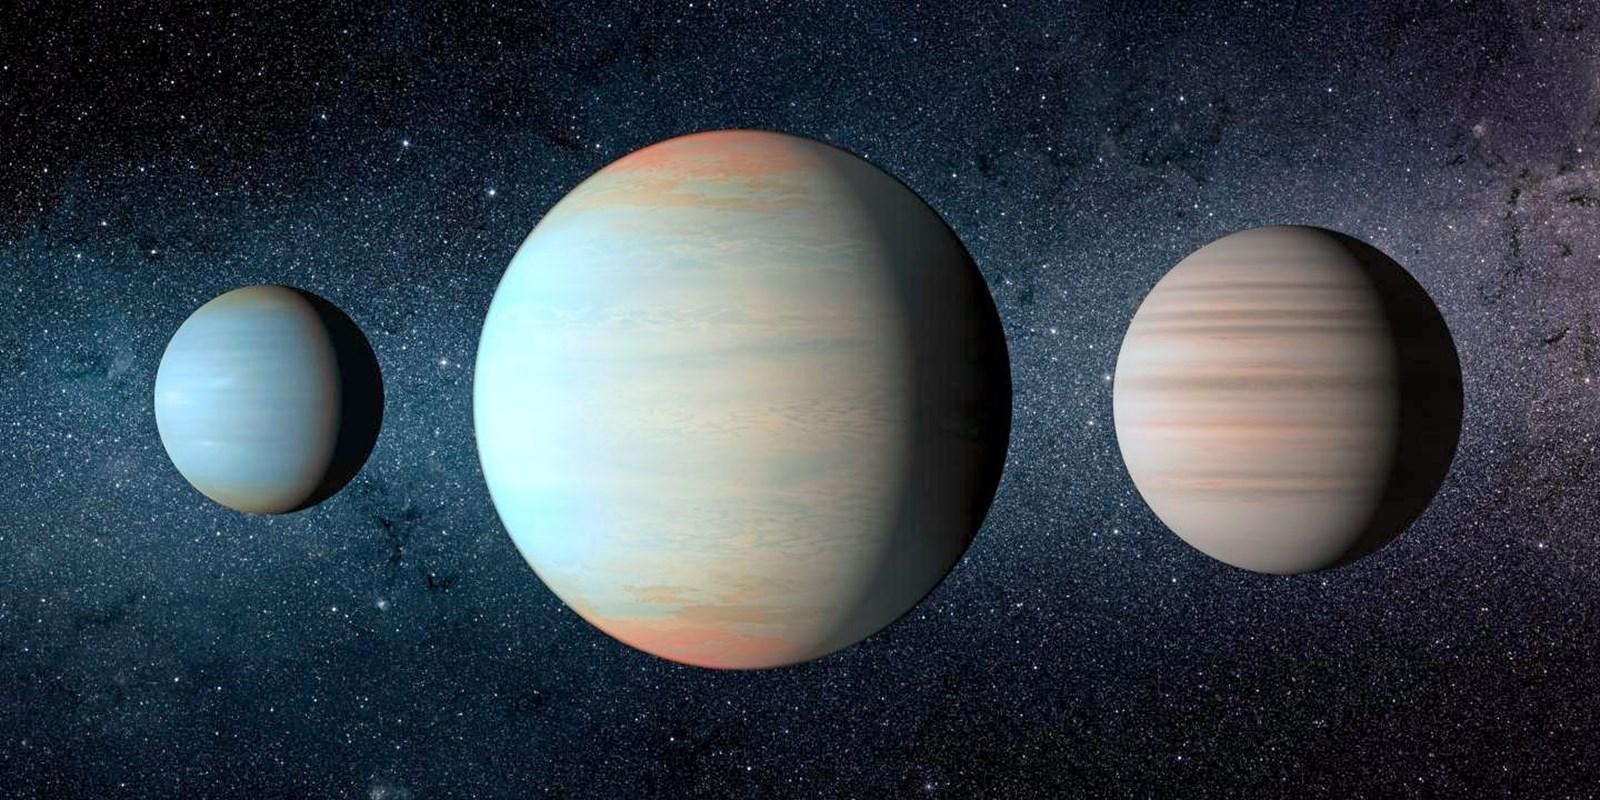 Dritte Welt um den Doppelstern Kepler-47 entdeckt